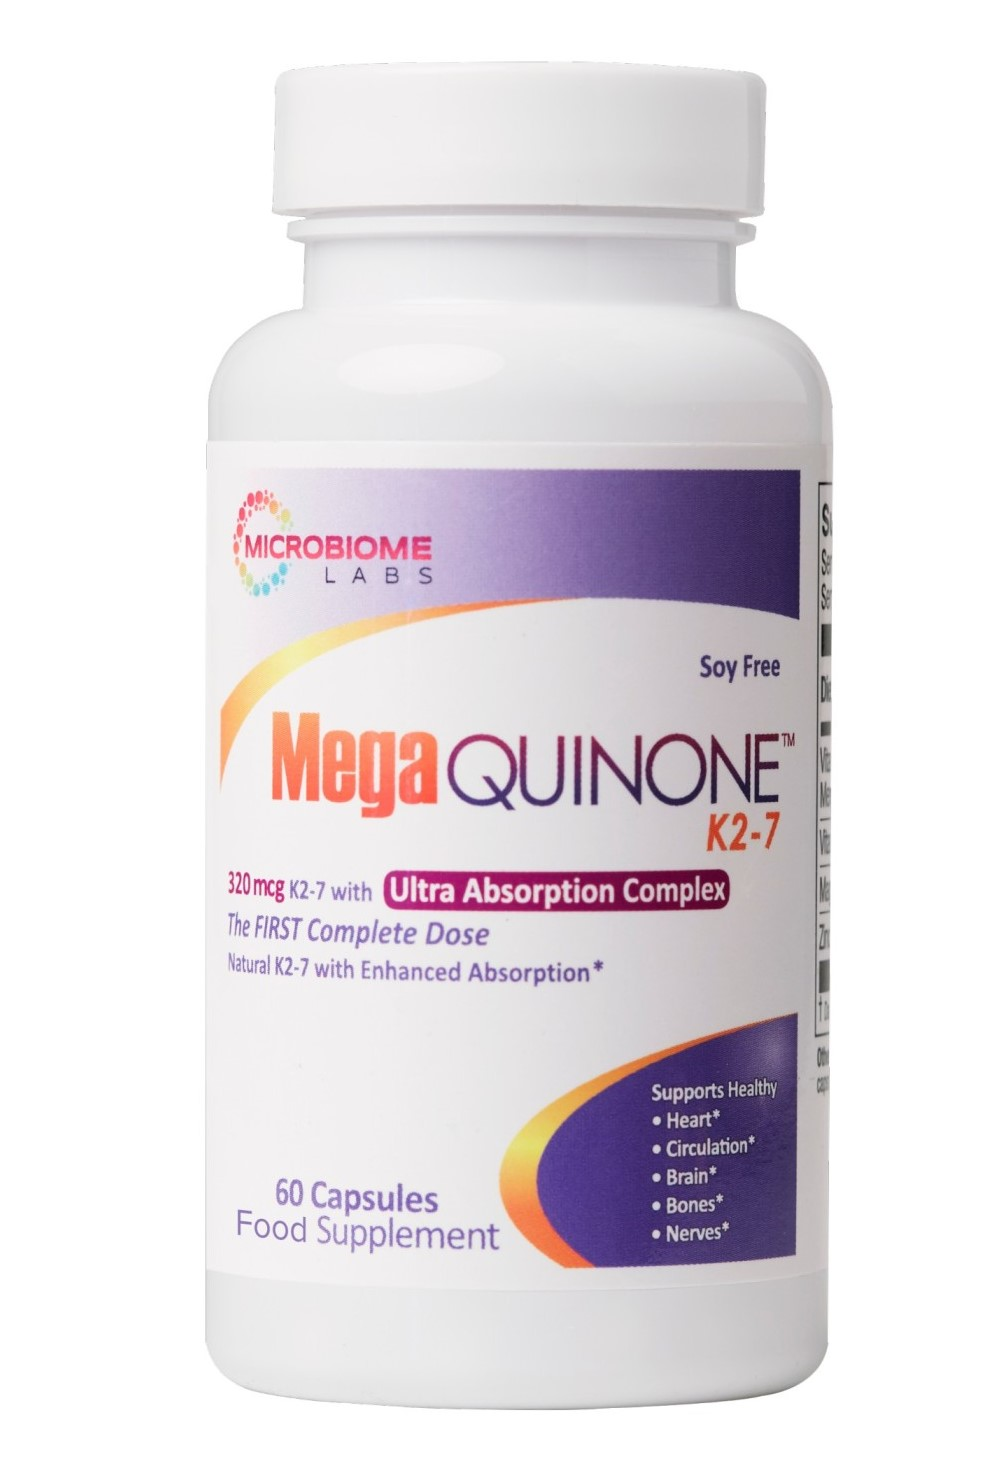 MegaQuinone K2-7 60's